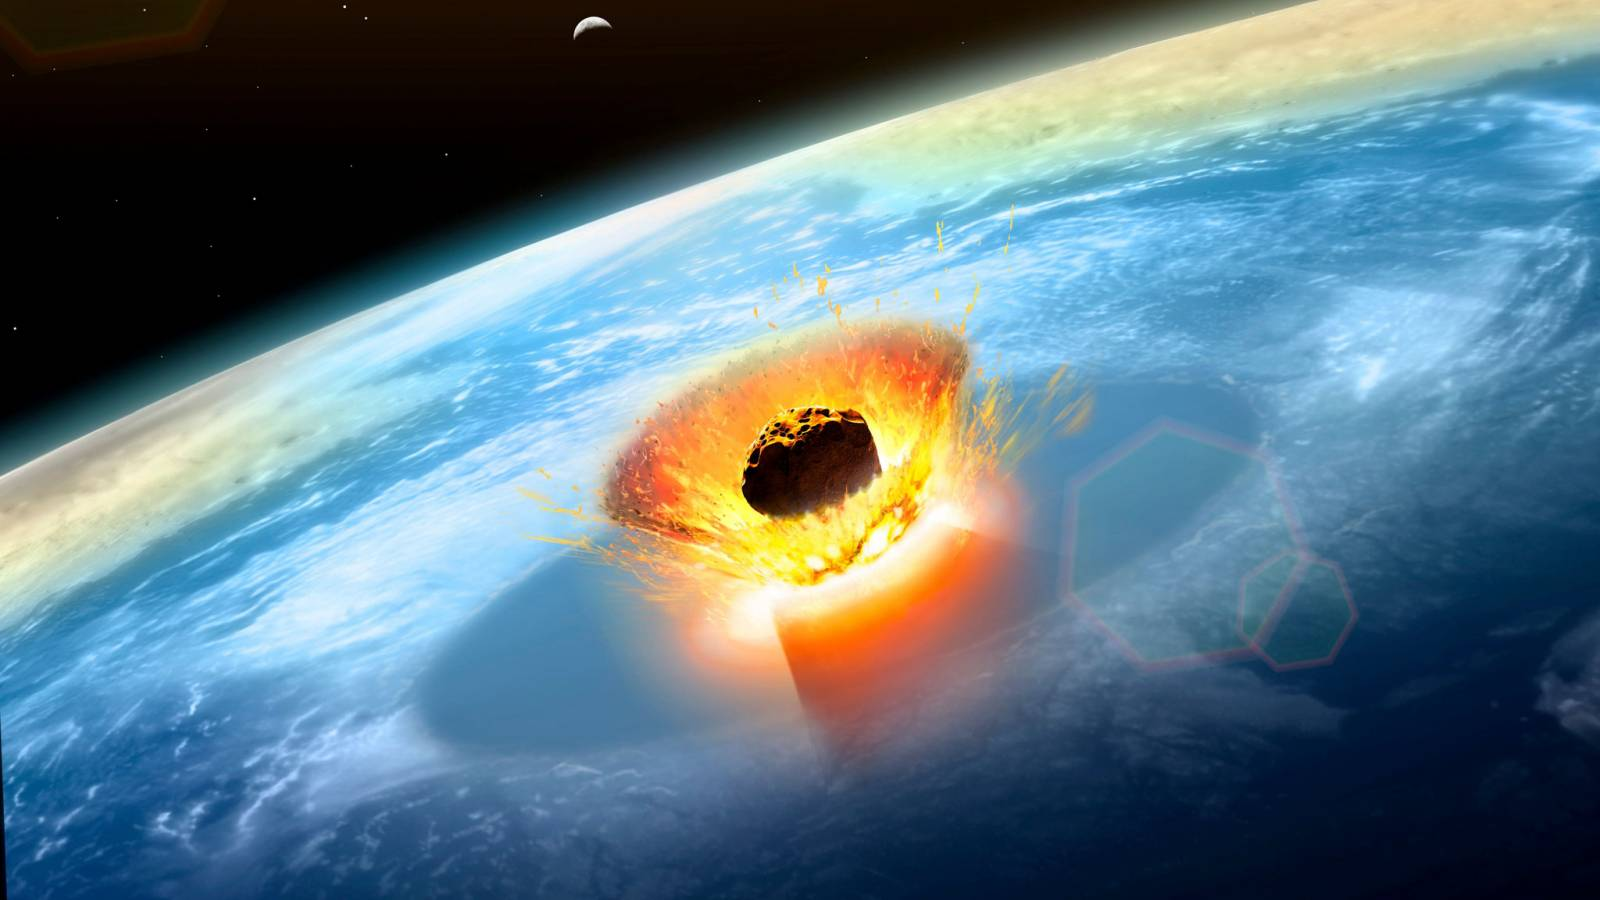 NASA. 6 Asteroizi se Indreapta cu VITEZA spre Pamant VIDEO